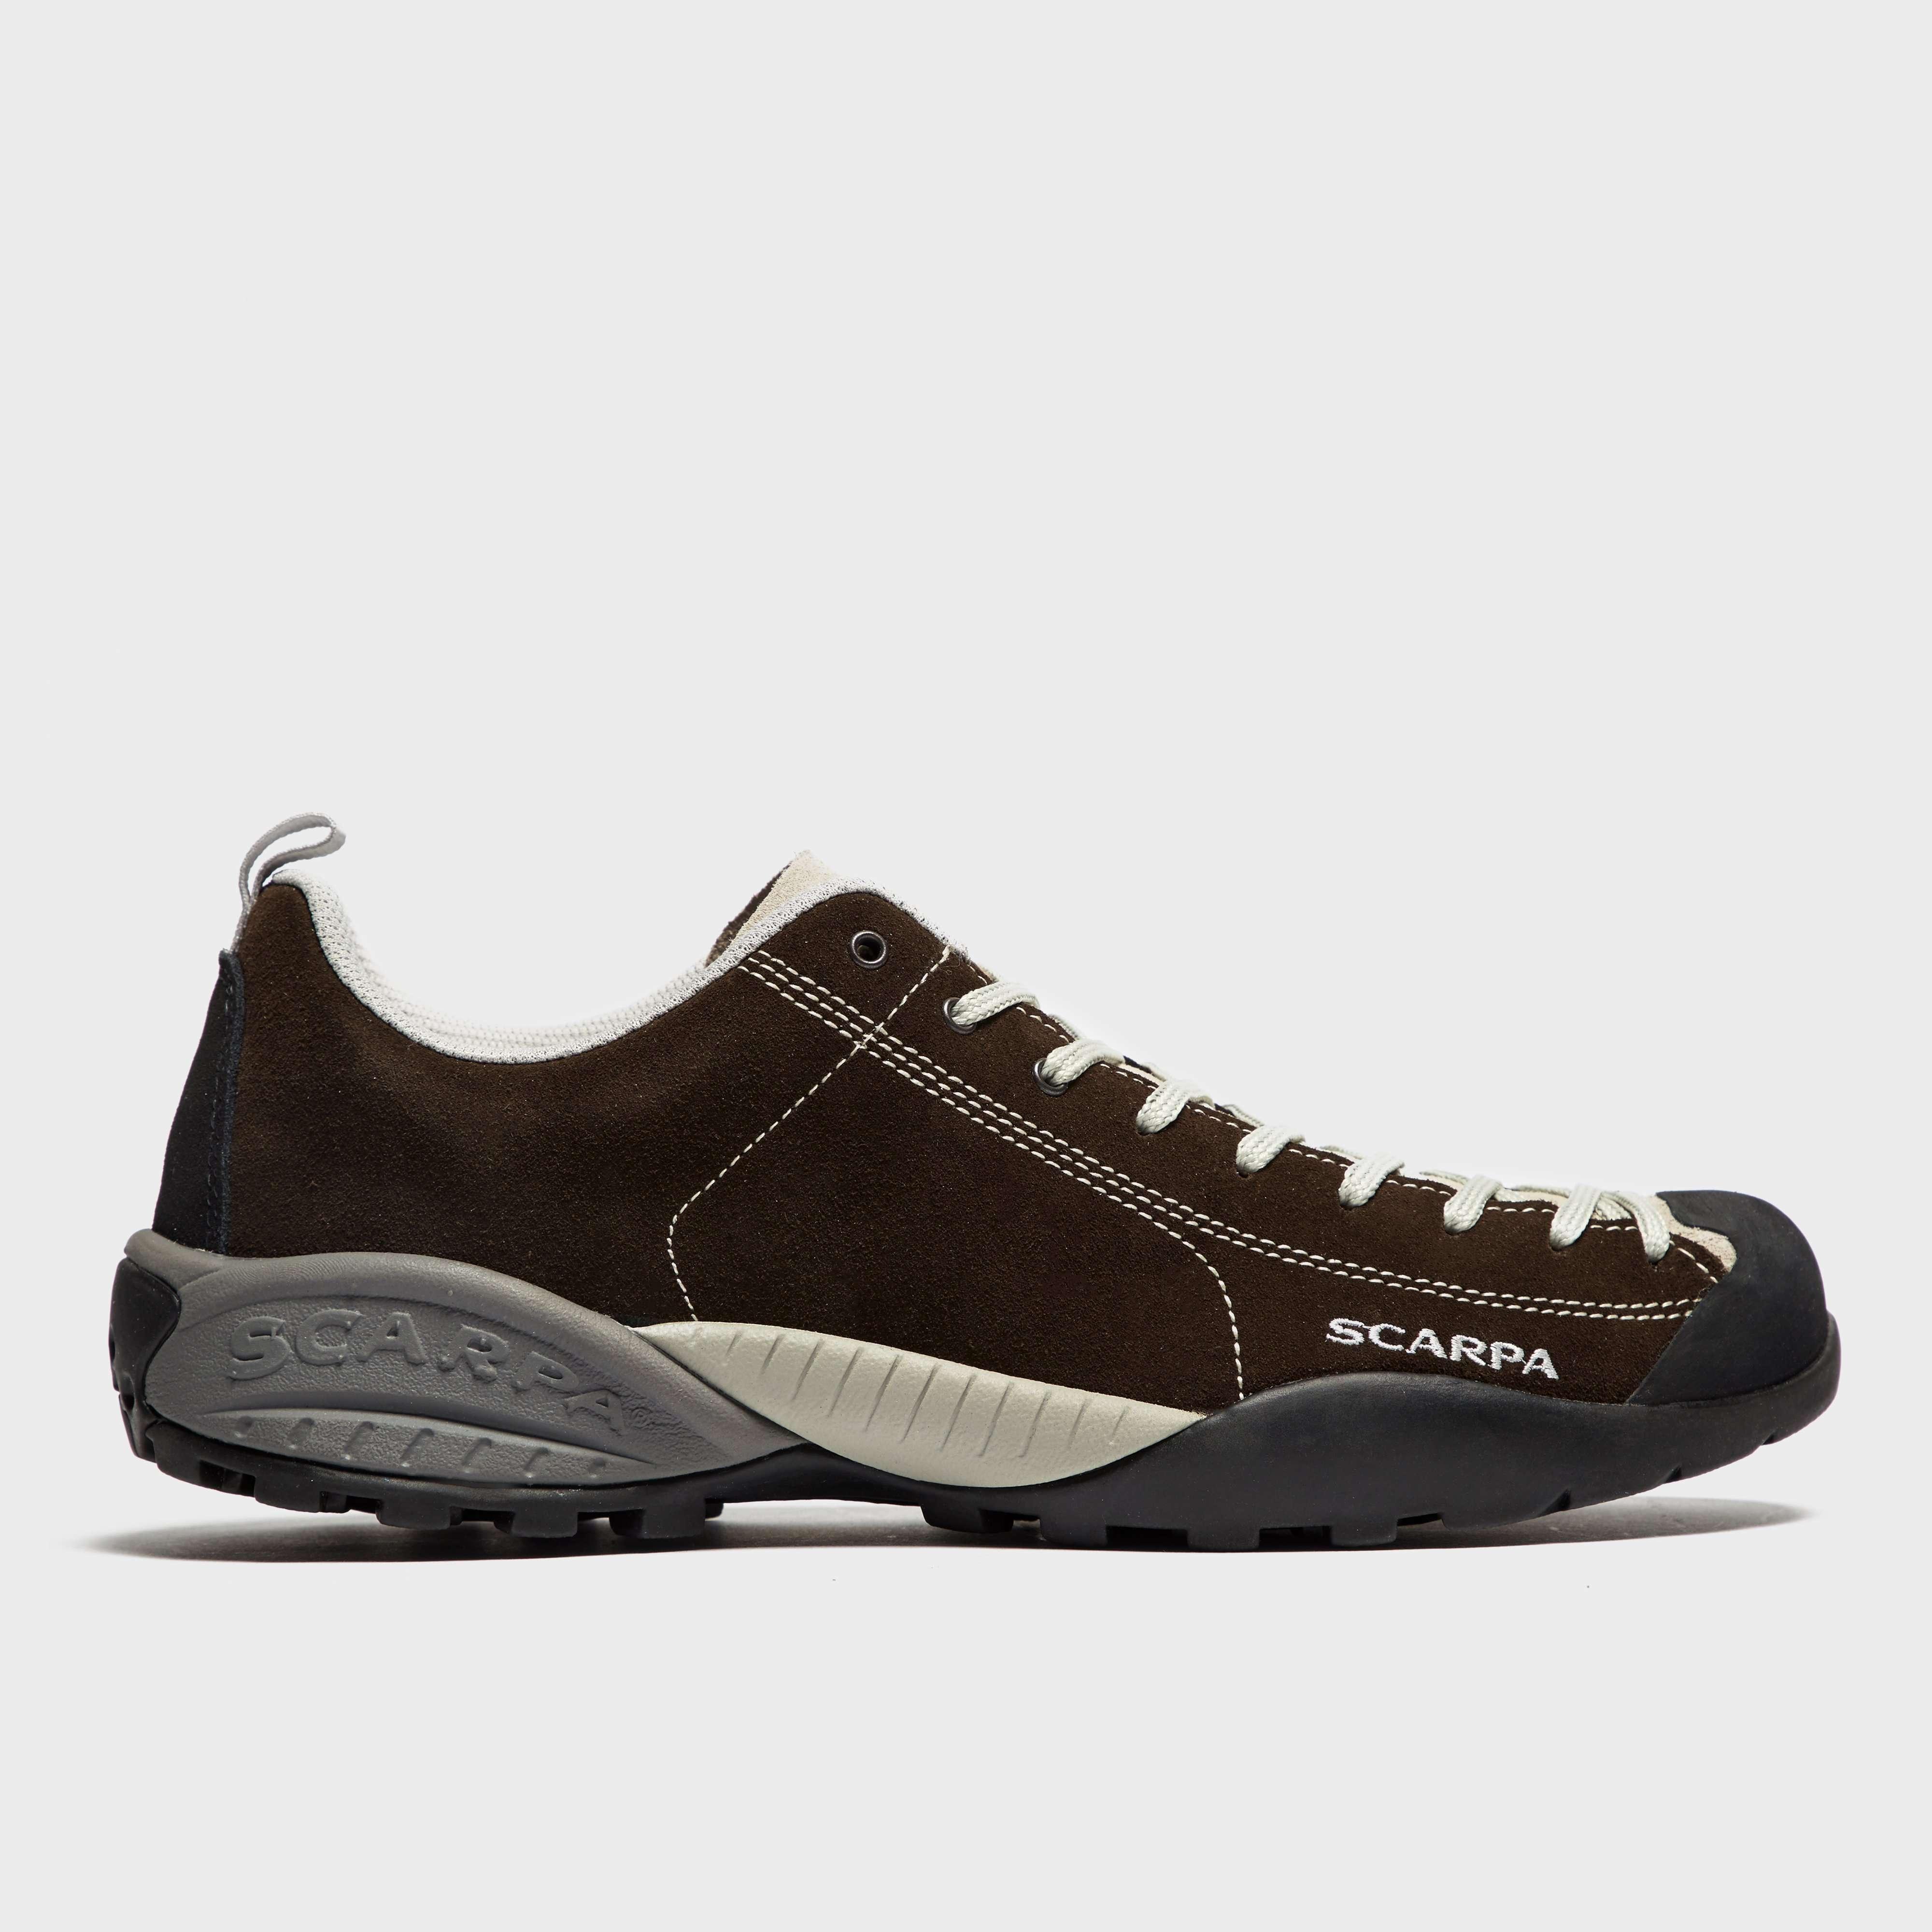 SCARPA Men's Mojito Shoe